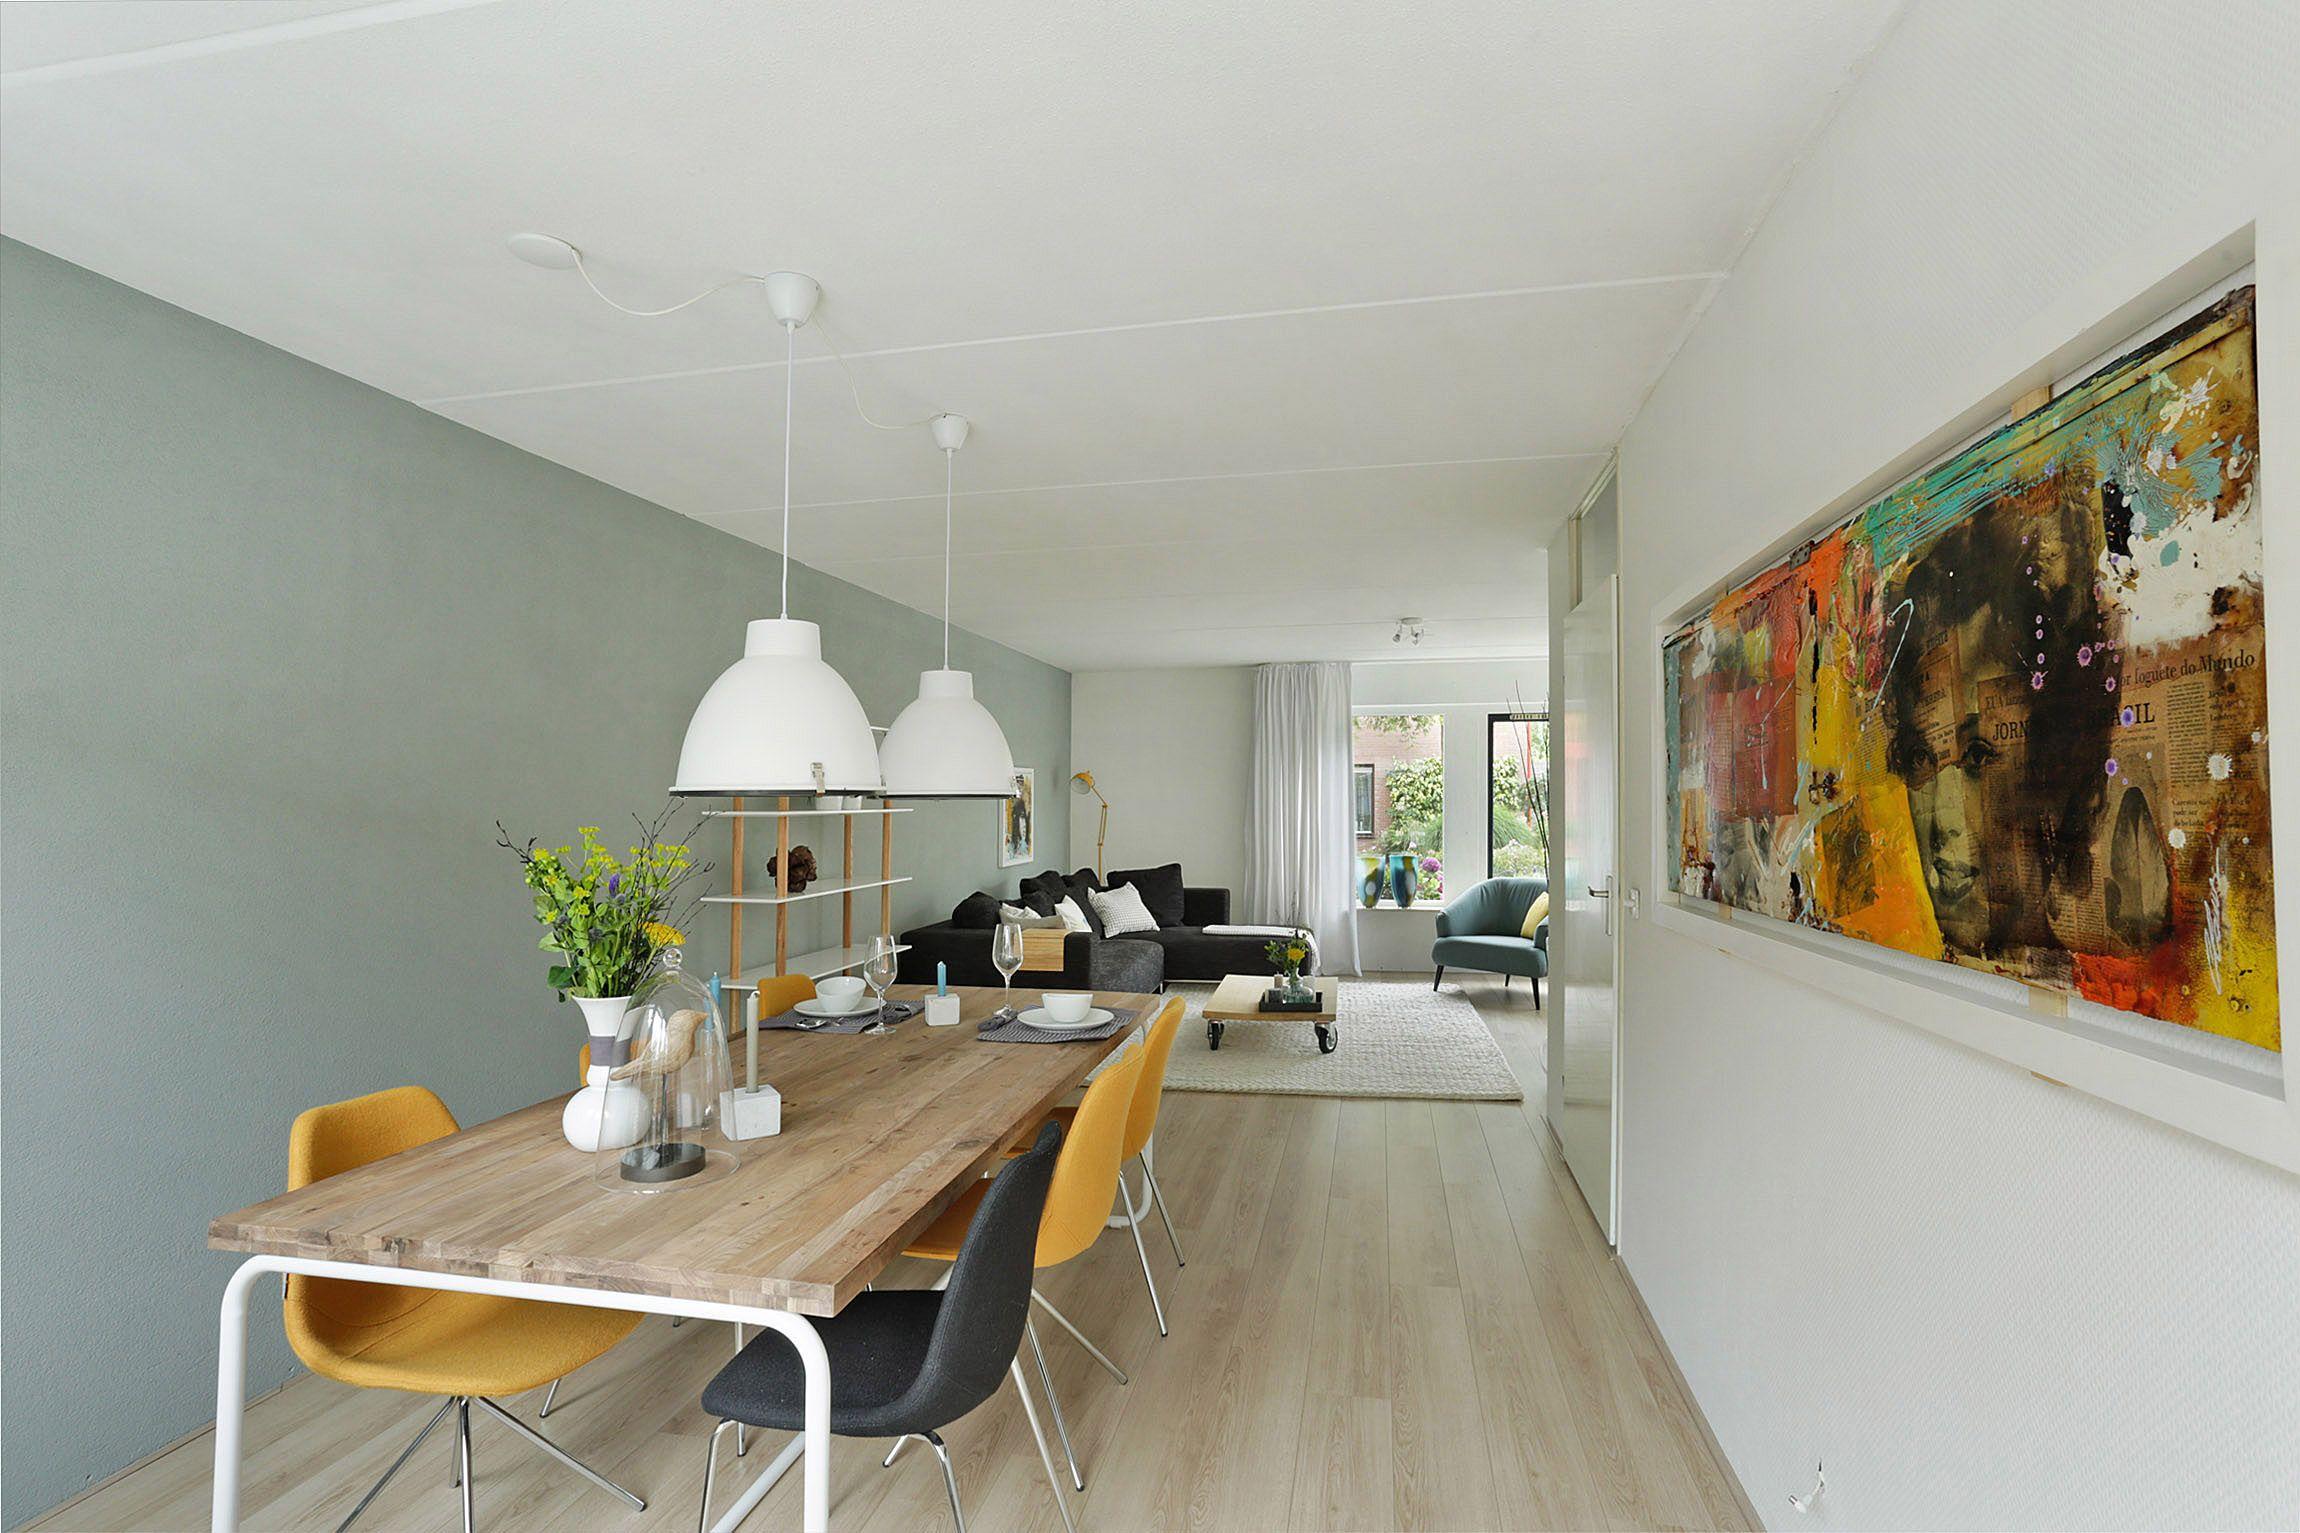 makeover woonkamer - Google zoeken - Interieur living | Pinterest ...